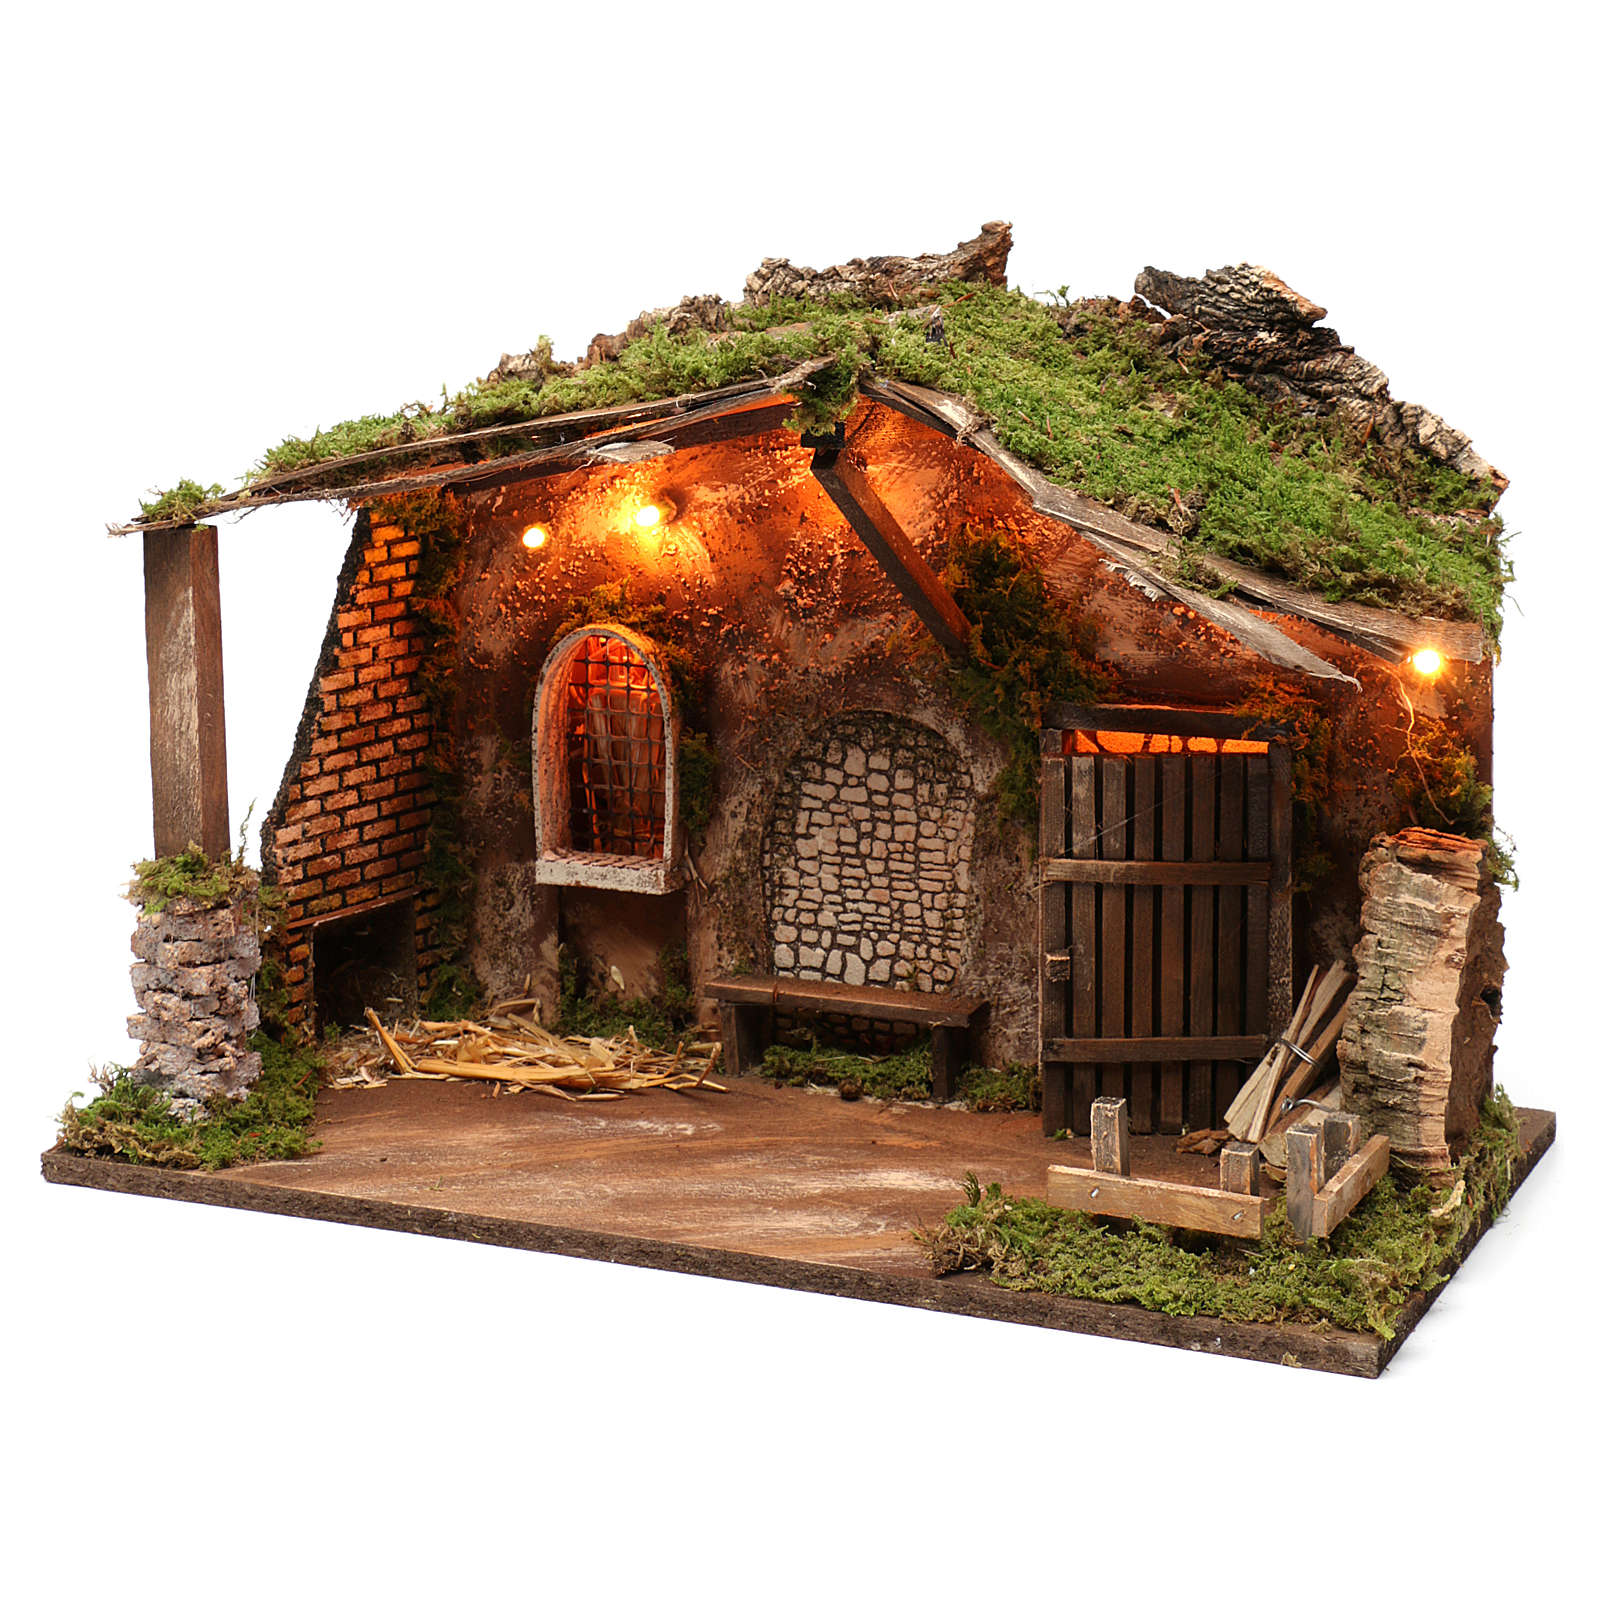 Cabaña para belén con luces, dimensiones 40x50x30 cm 4